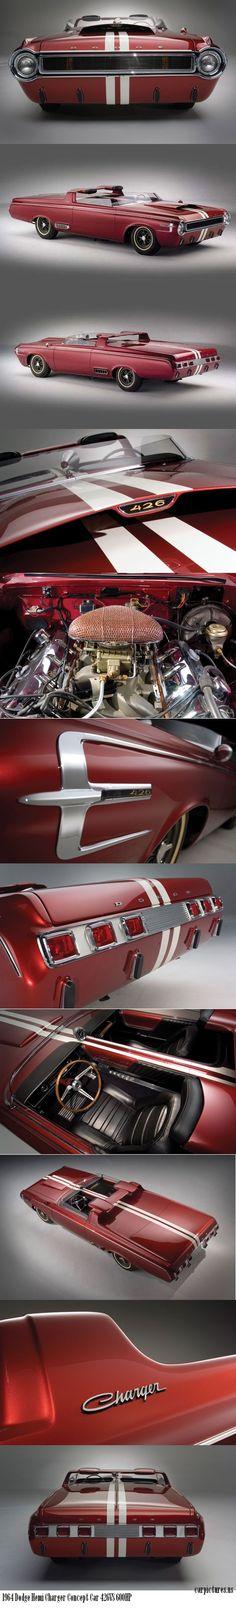 1964 Dodge Hemi Charger Concept Car. 426 Hemi, 600HP.